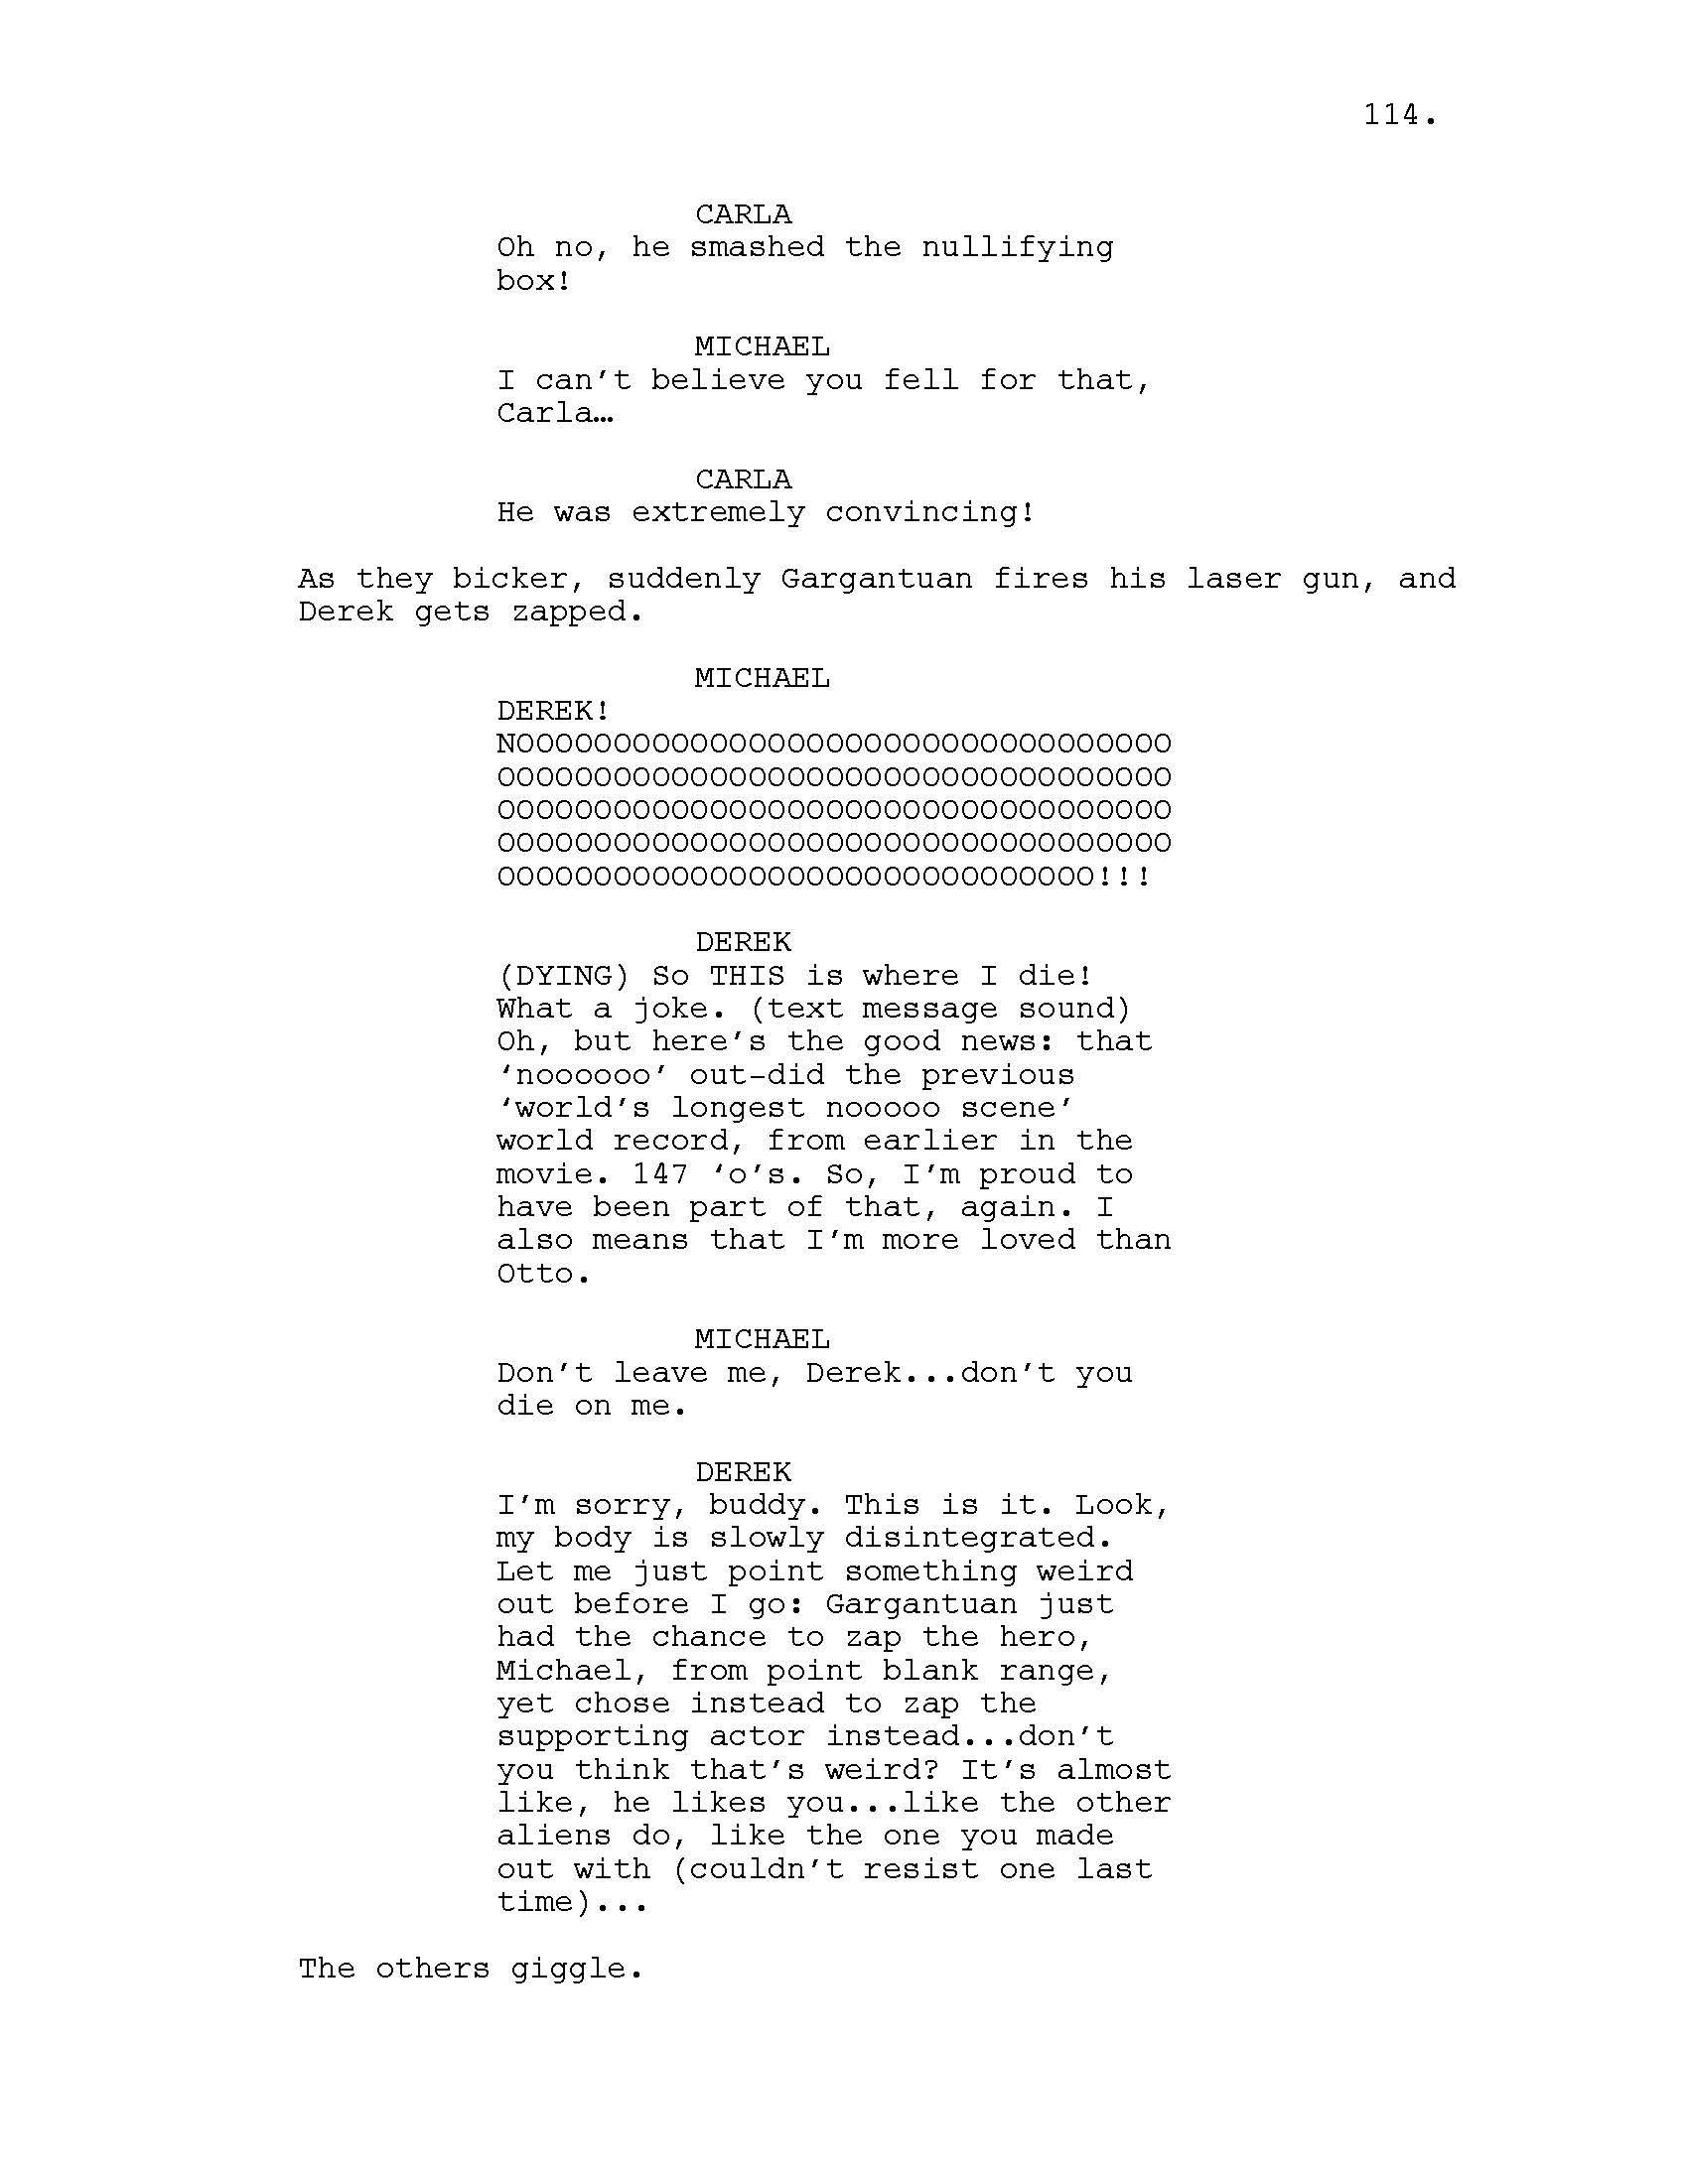 INVISIBLE WORLD SCRIPT_Page_115.jpg